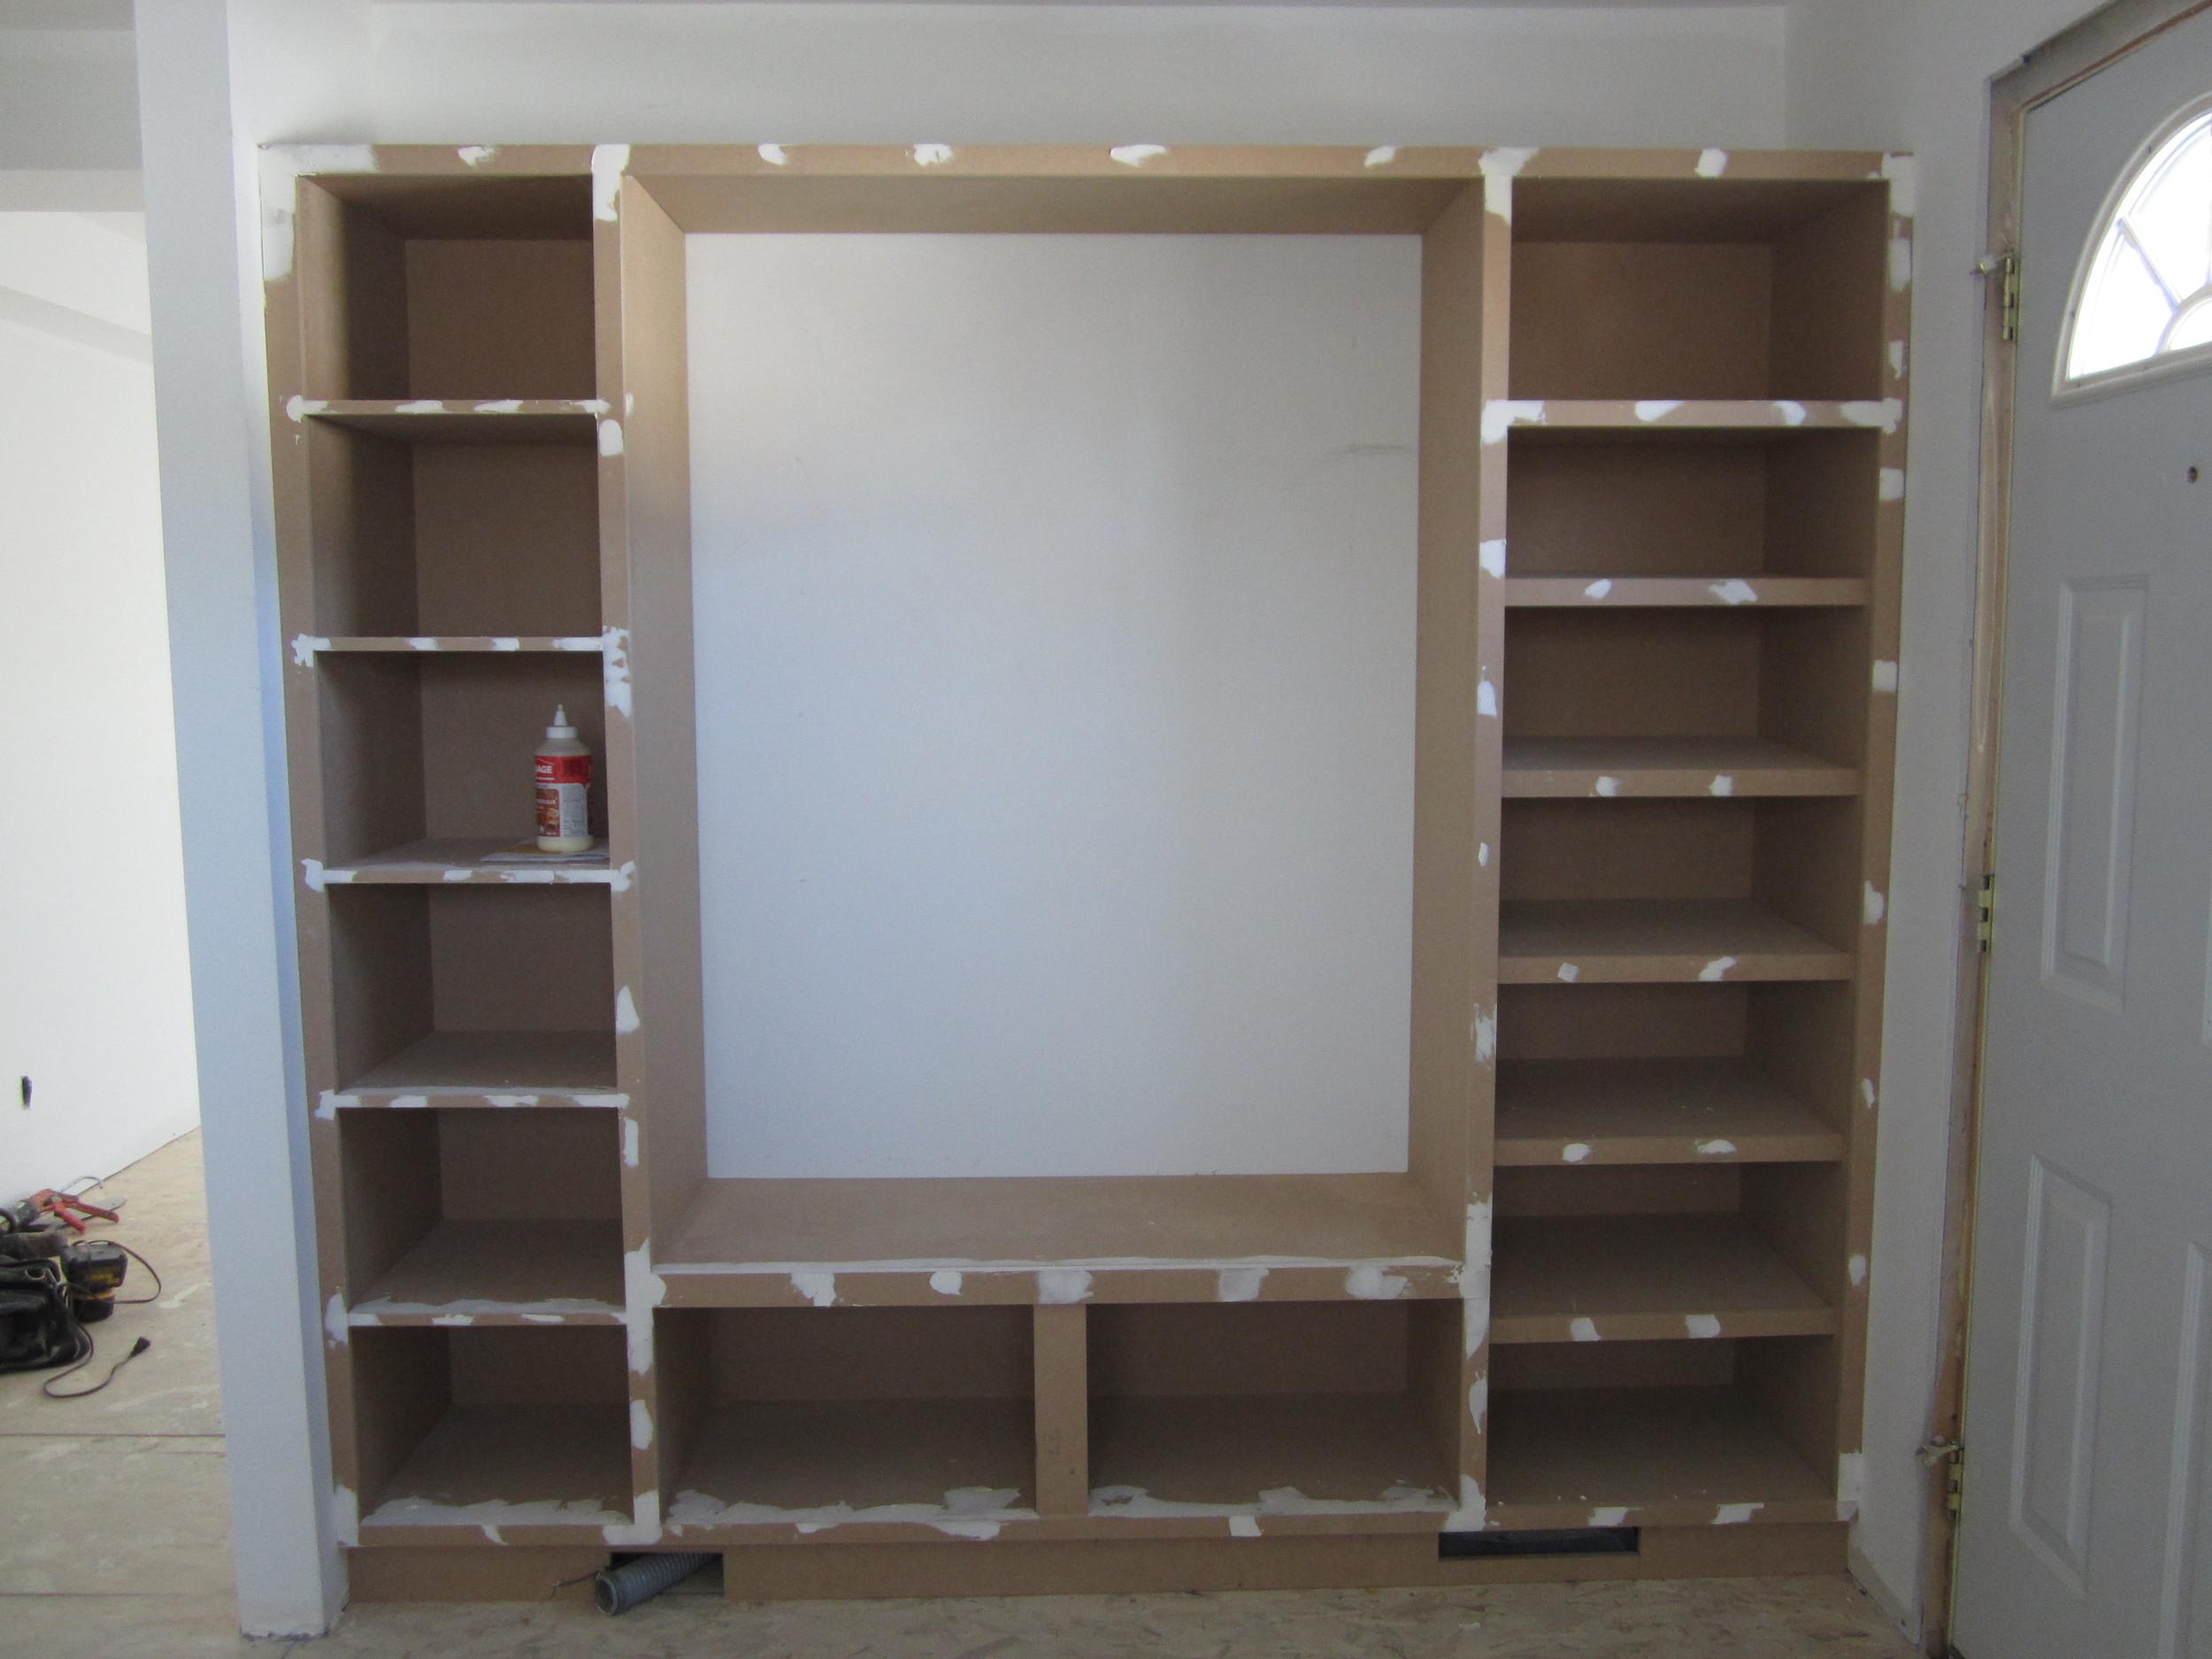 Travis built this custom locker unit for the mudroom entrance.